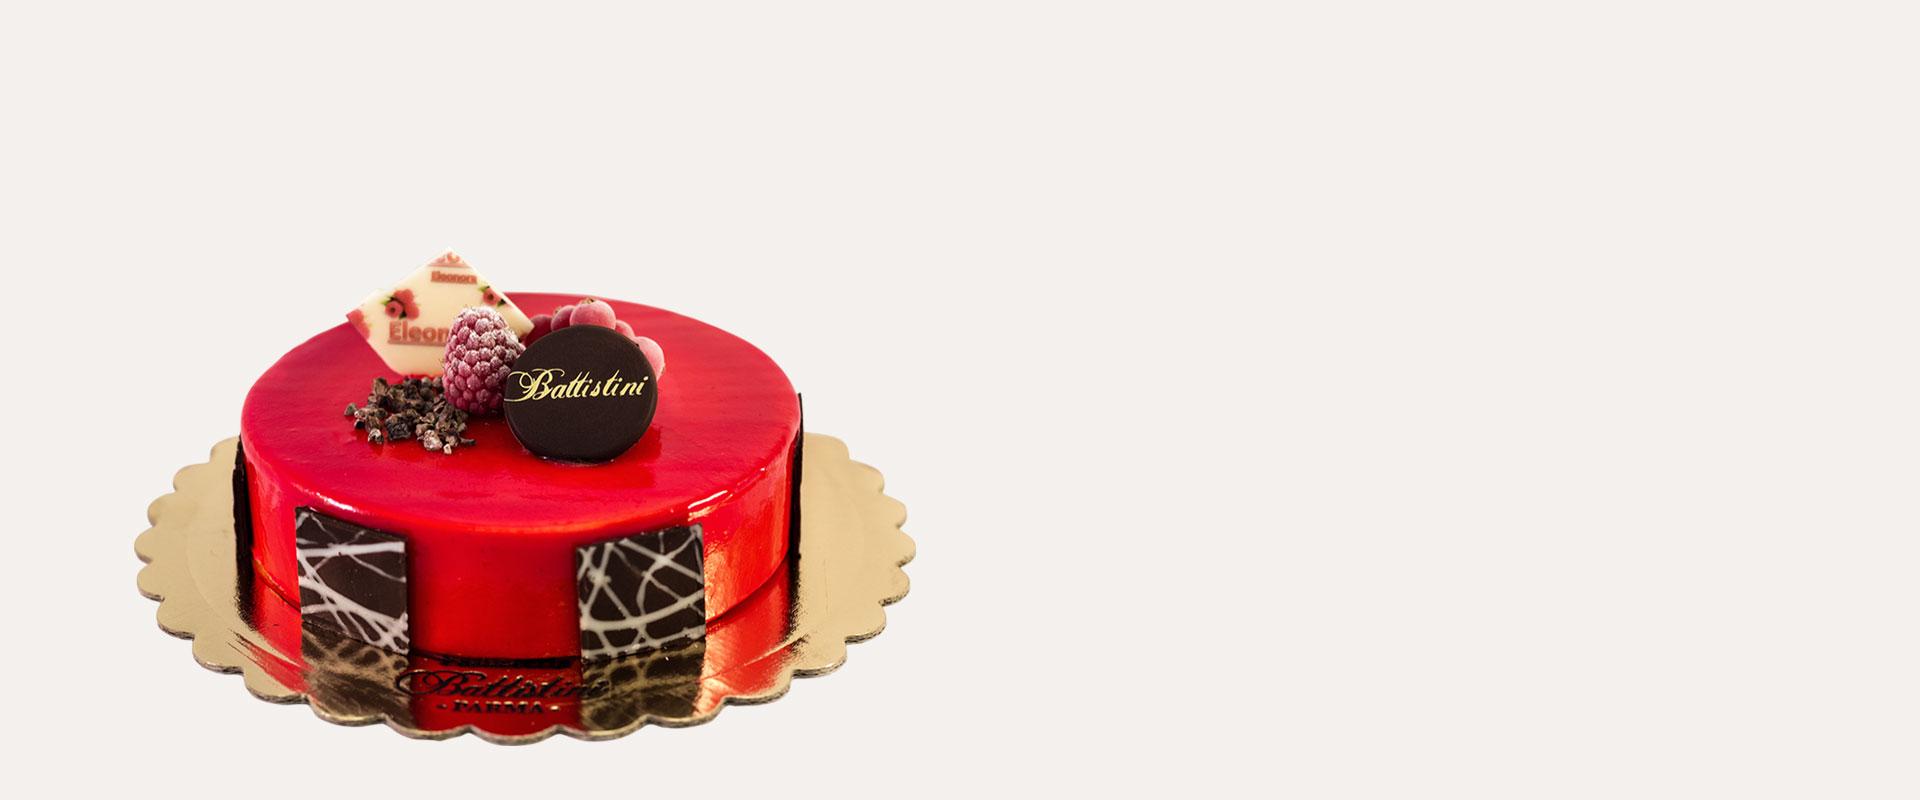 torte-moderne-parma-battistini